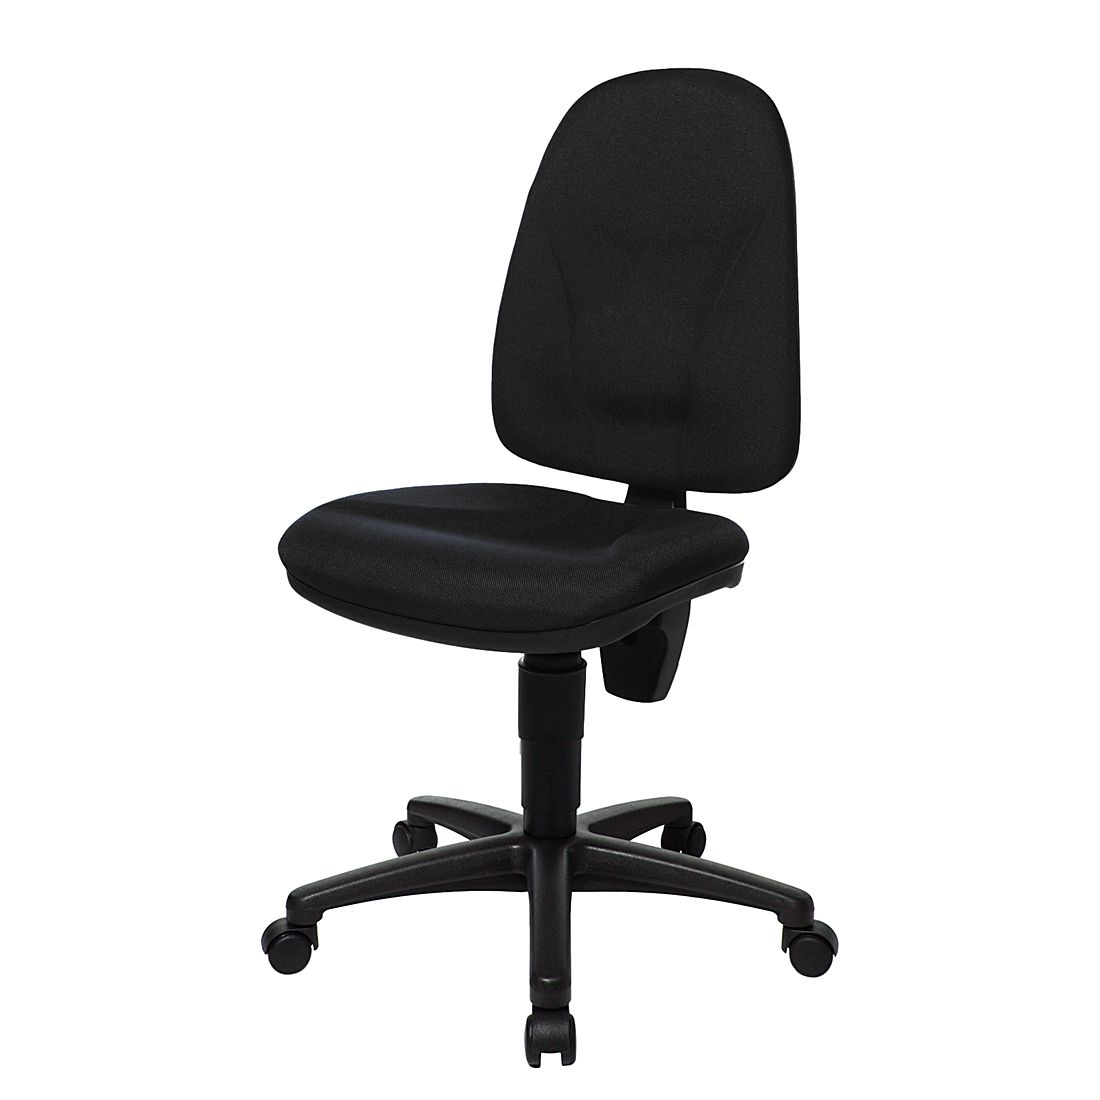 Bürostuhl Point 20 – Textilbezug – Schwarz, Topstar günstig bestellen